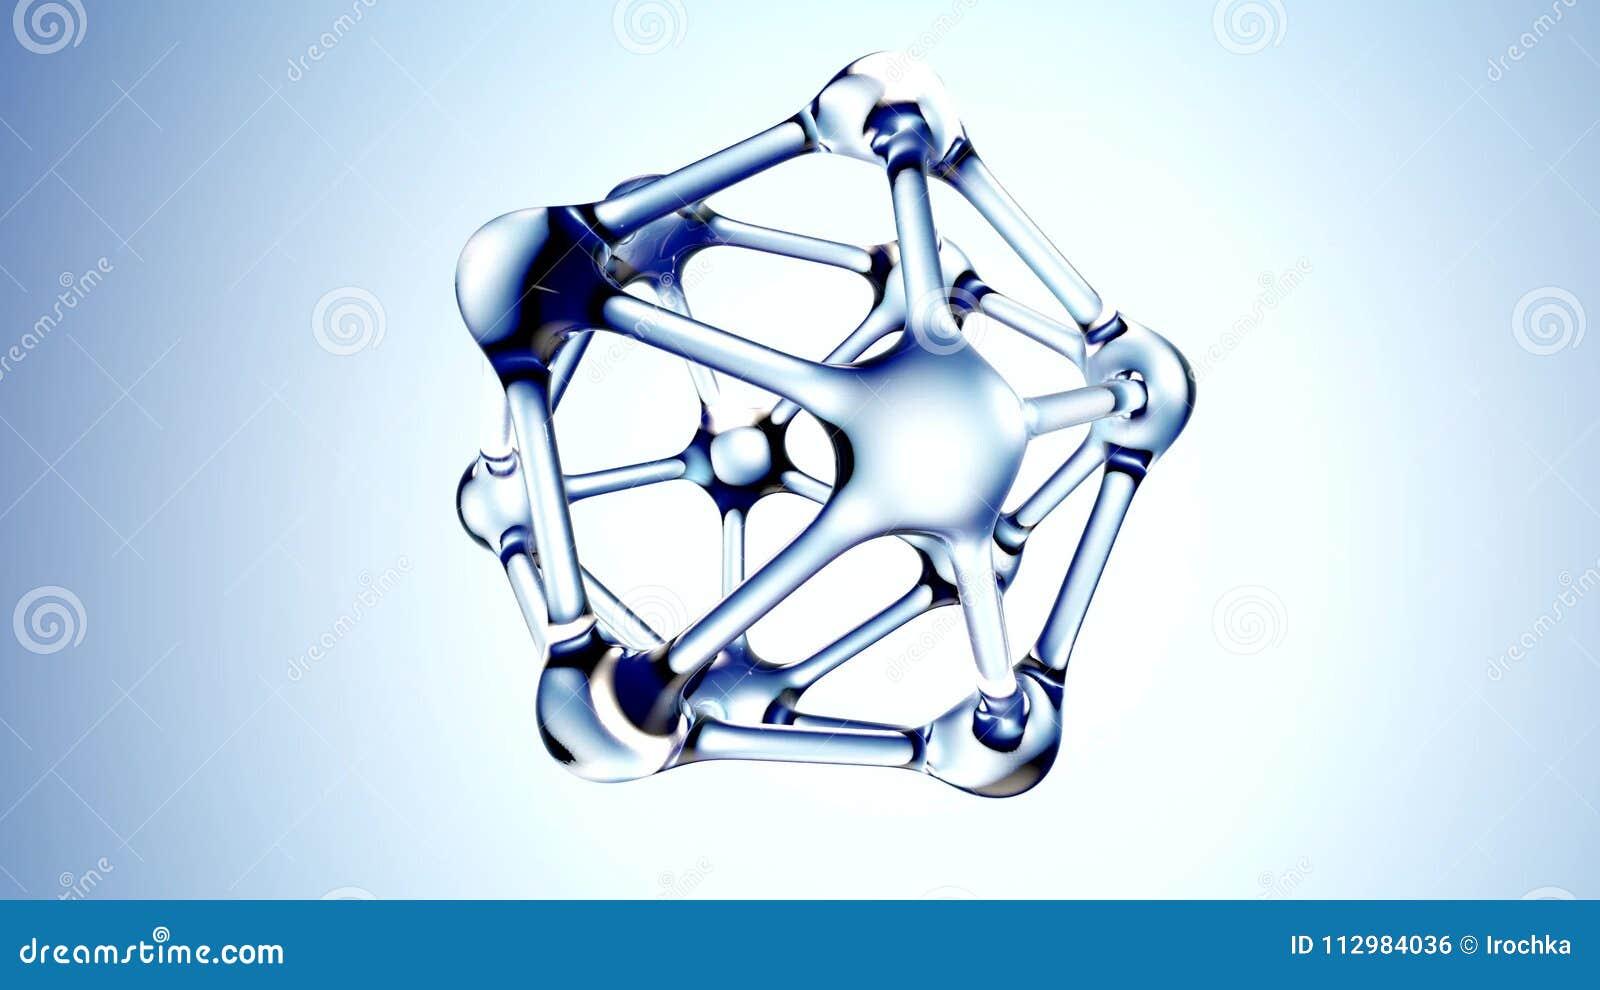 DNA molecule made of water 3d illustration